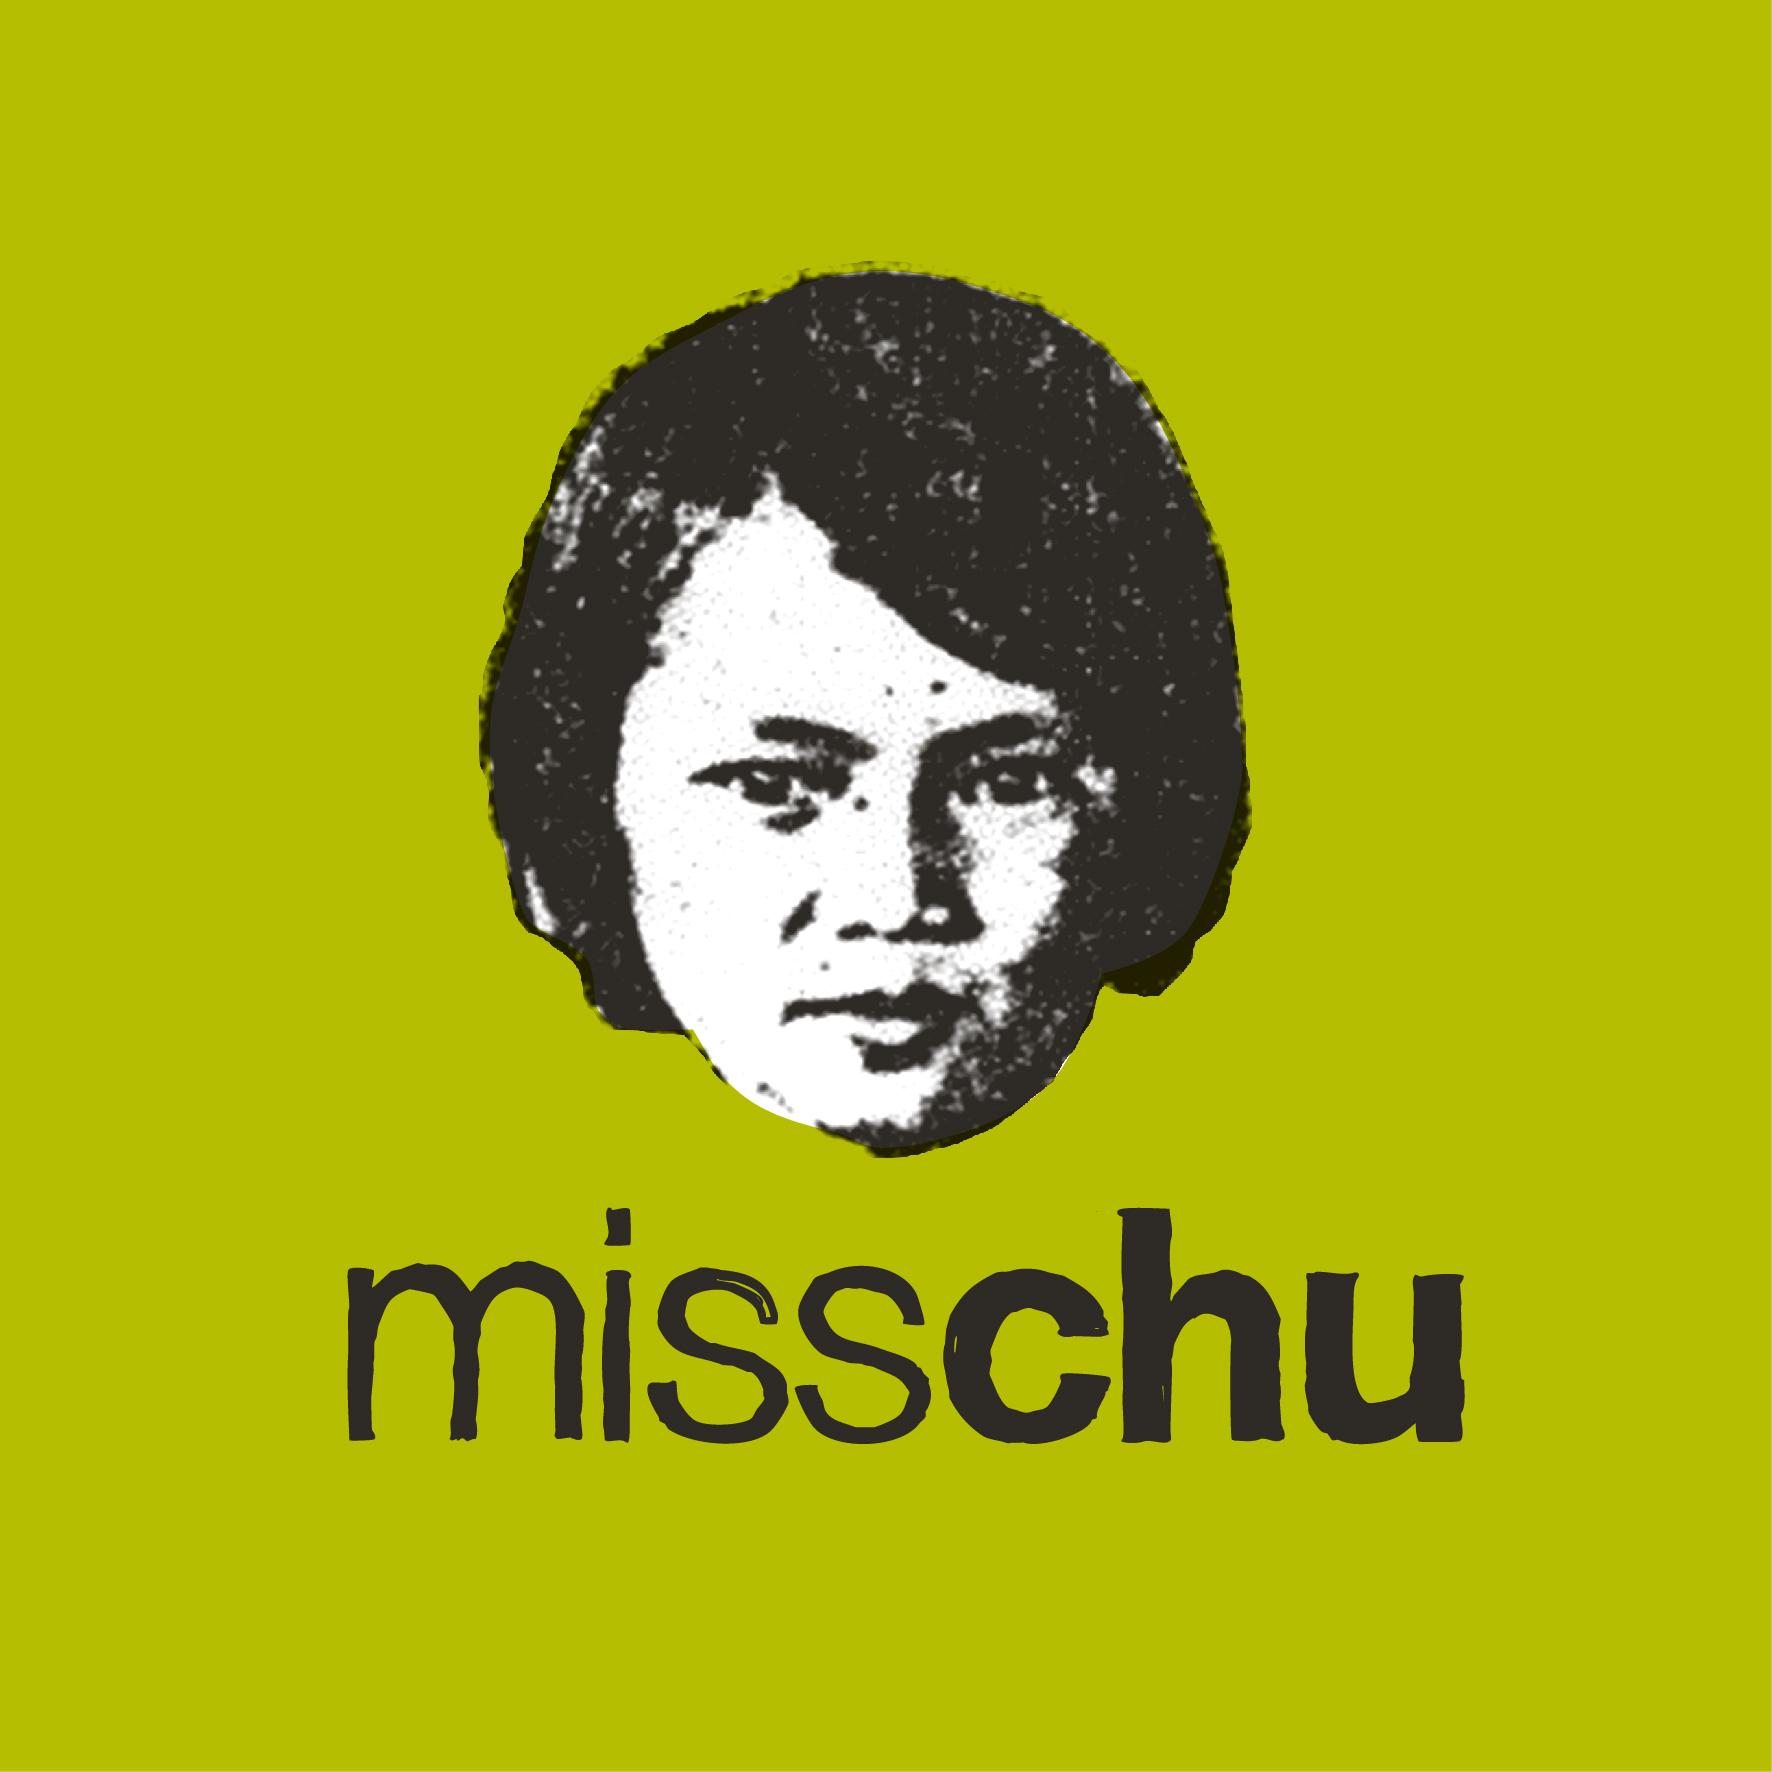 misschu the original Asian street-food 'tuckshop' - New franchise Noosa